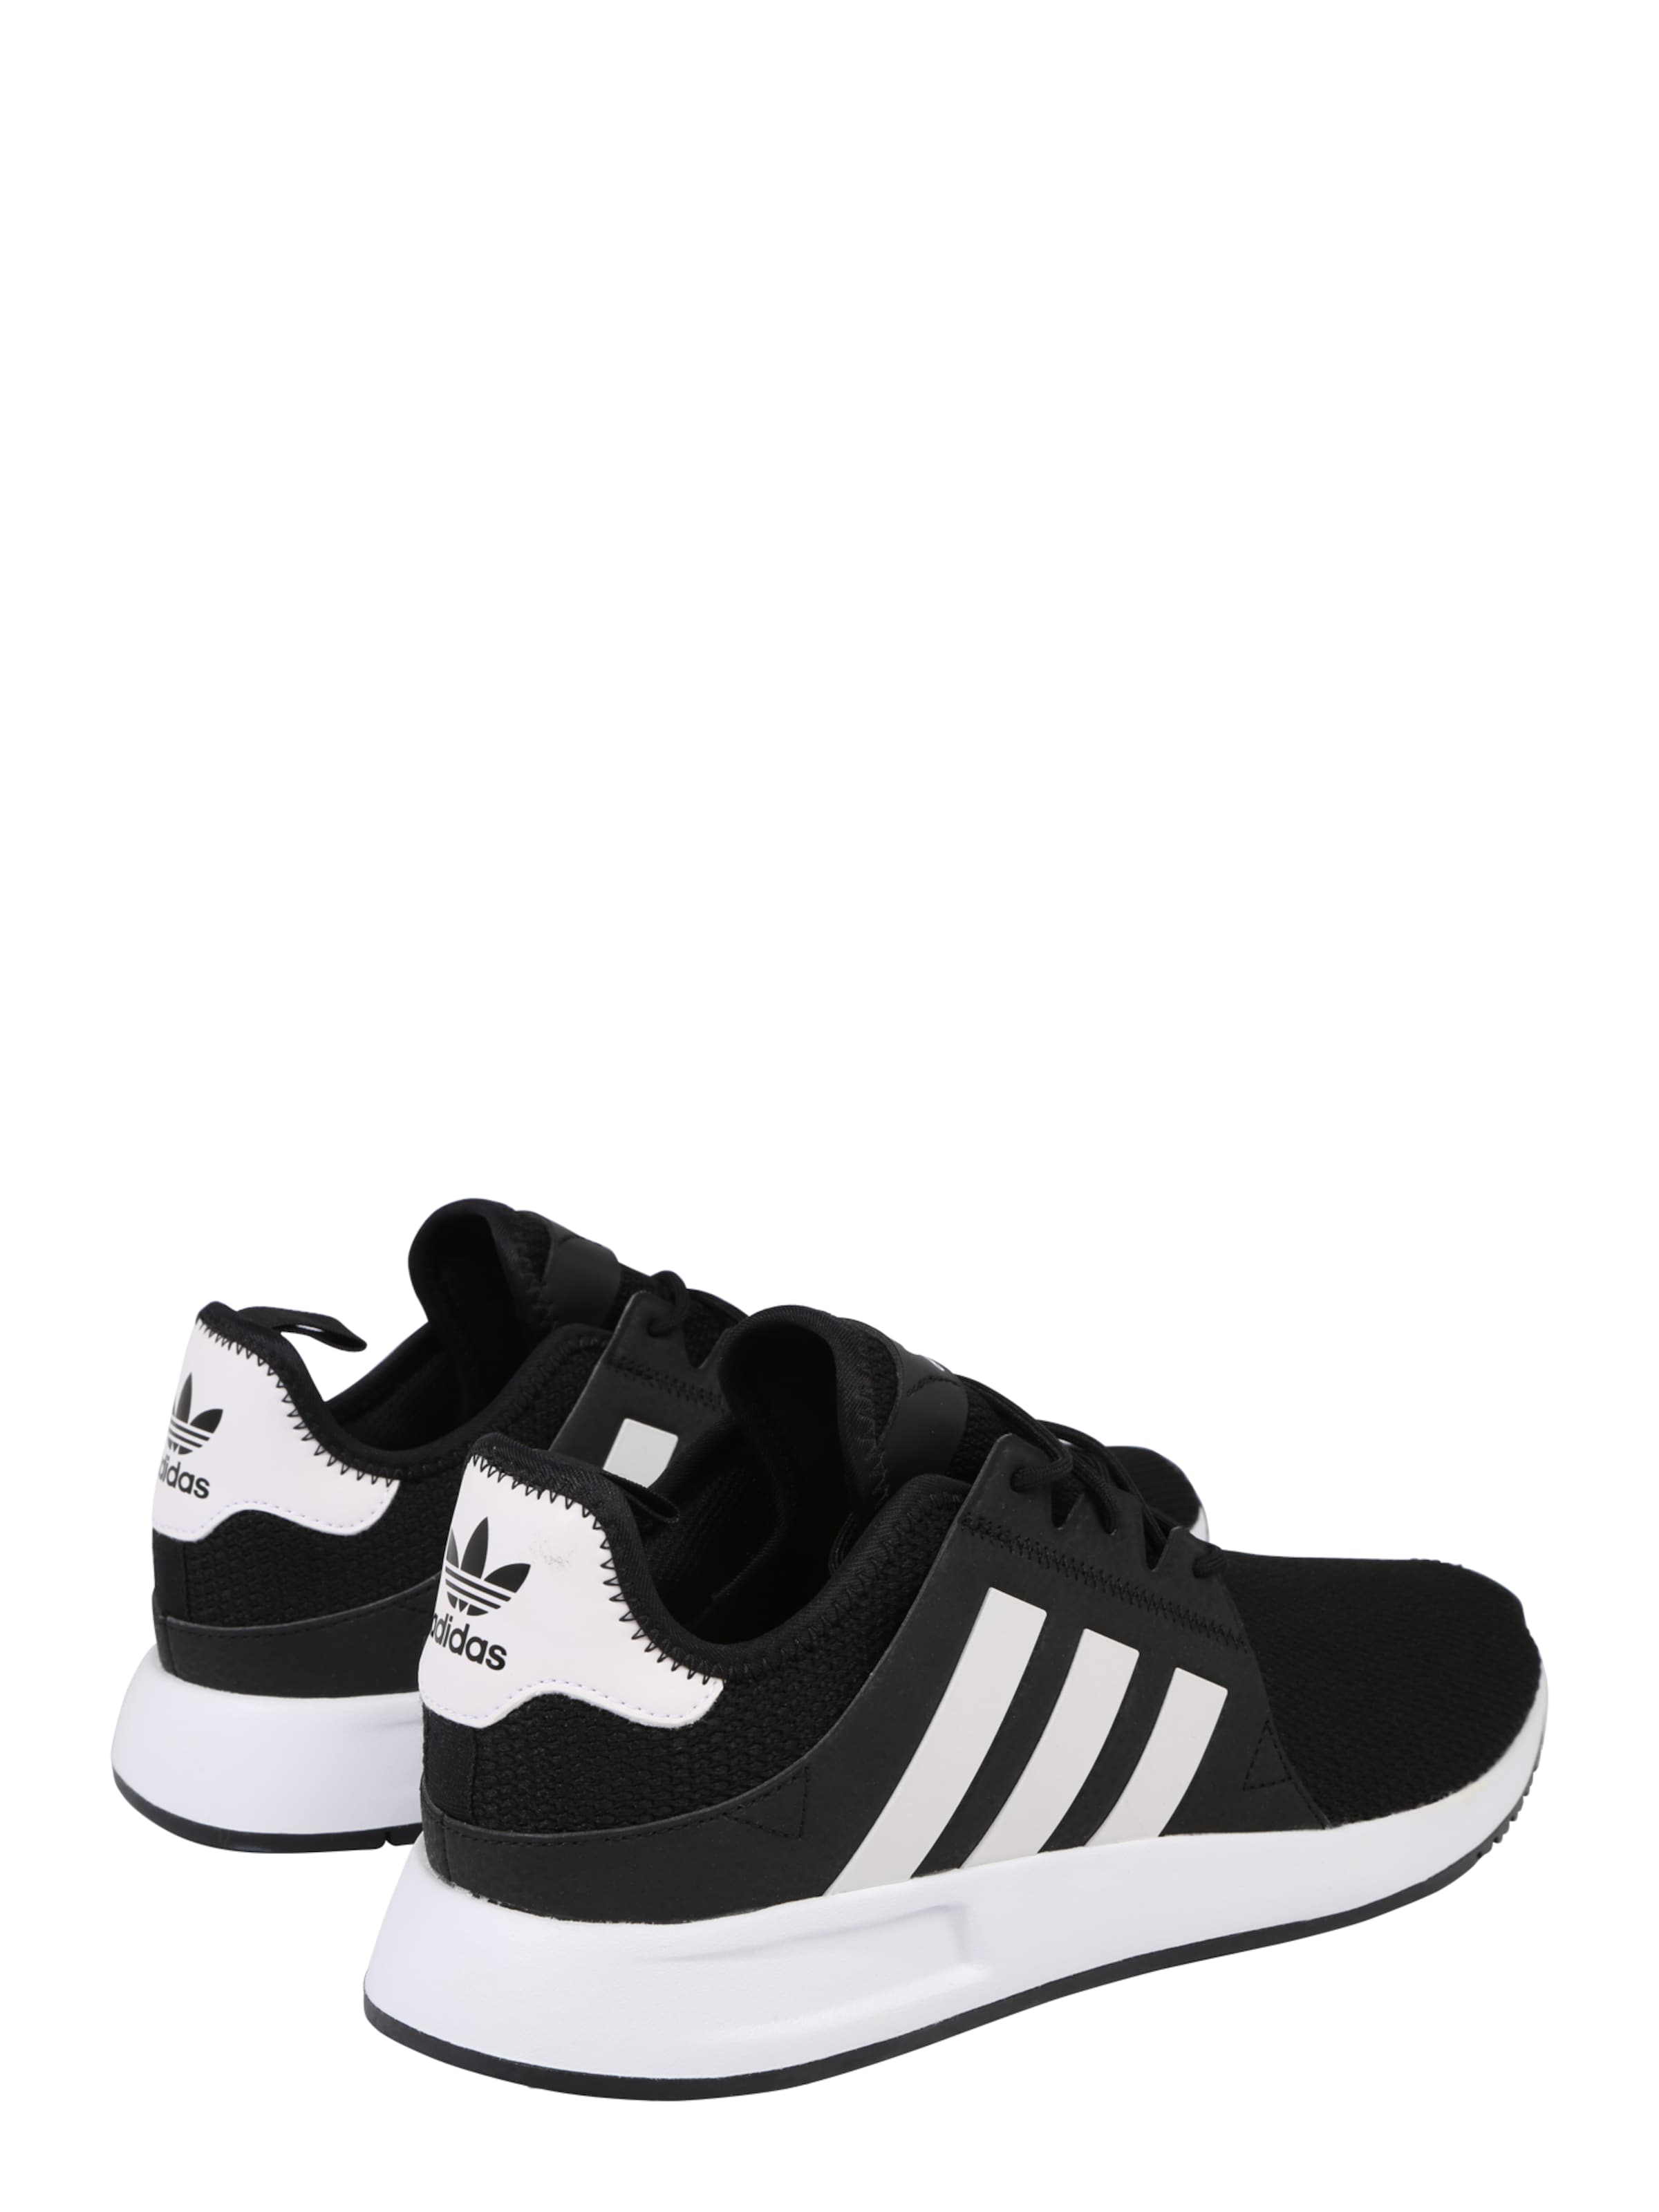 En Baskets plr' 'x Adidas Originals Basses NoirBlanc xBWrdeCoQ